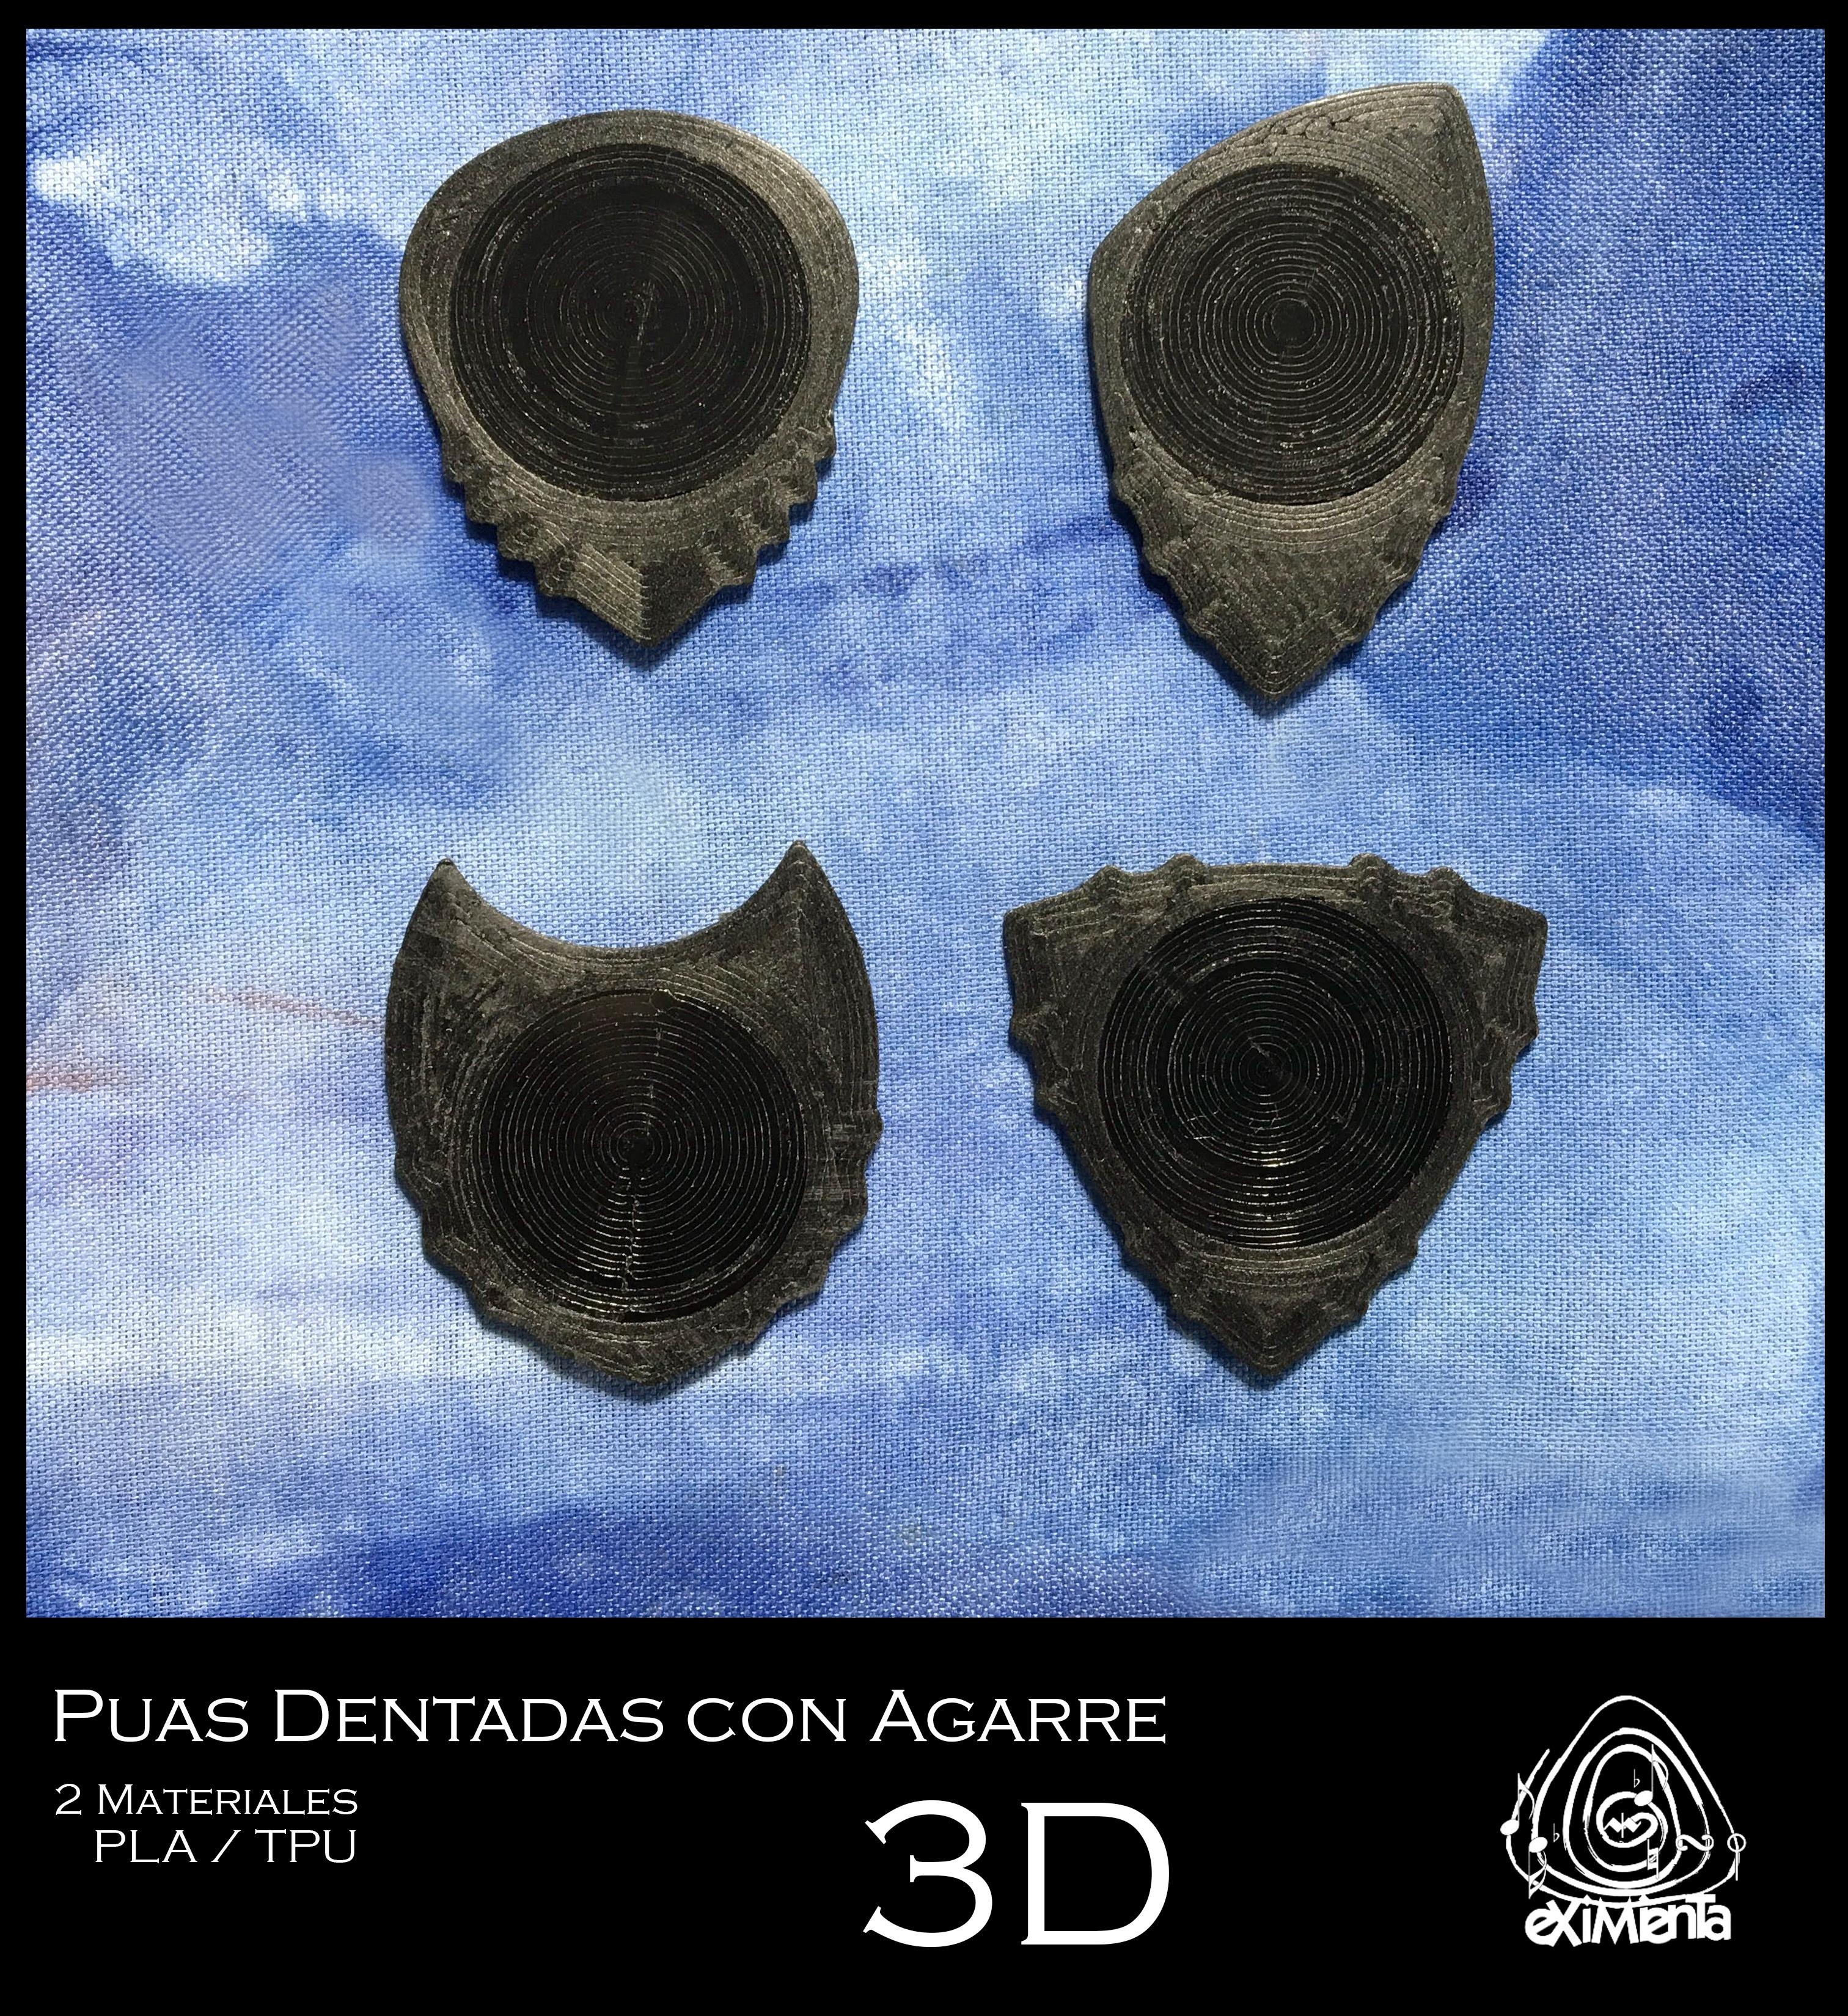 UNU PITA DUA TRIANGLE-DENT FC 22042020 foto.JPG Download free STL file UNU-DENT 3D Guitar Tine 2 Materials PLA / TPU Serrated Tines • Design to 3D print, carleslluisar